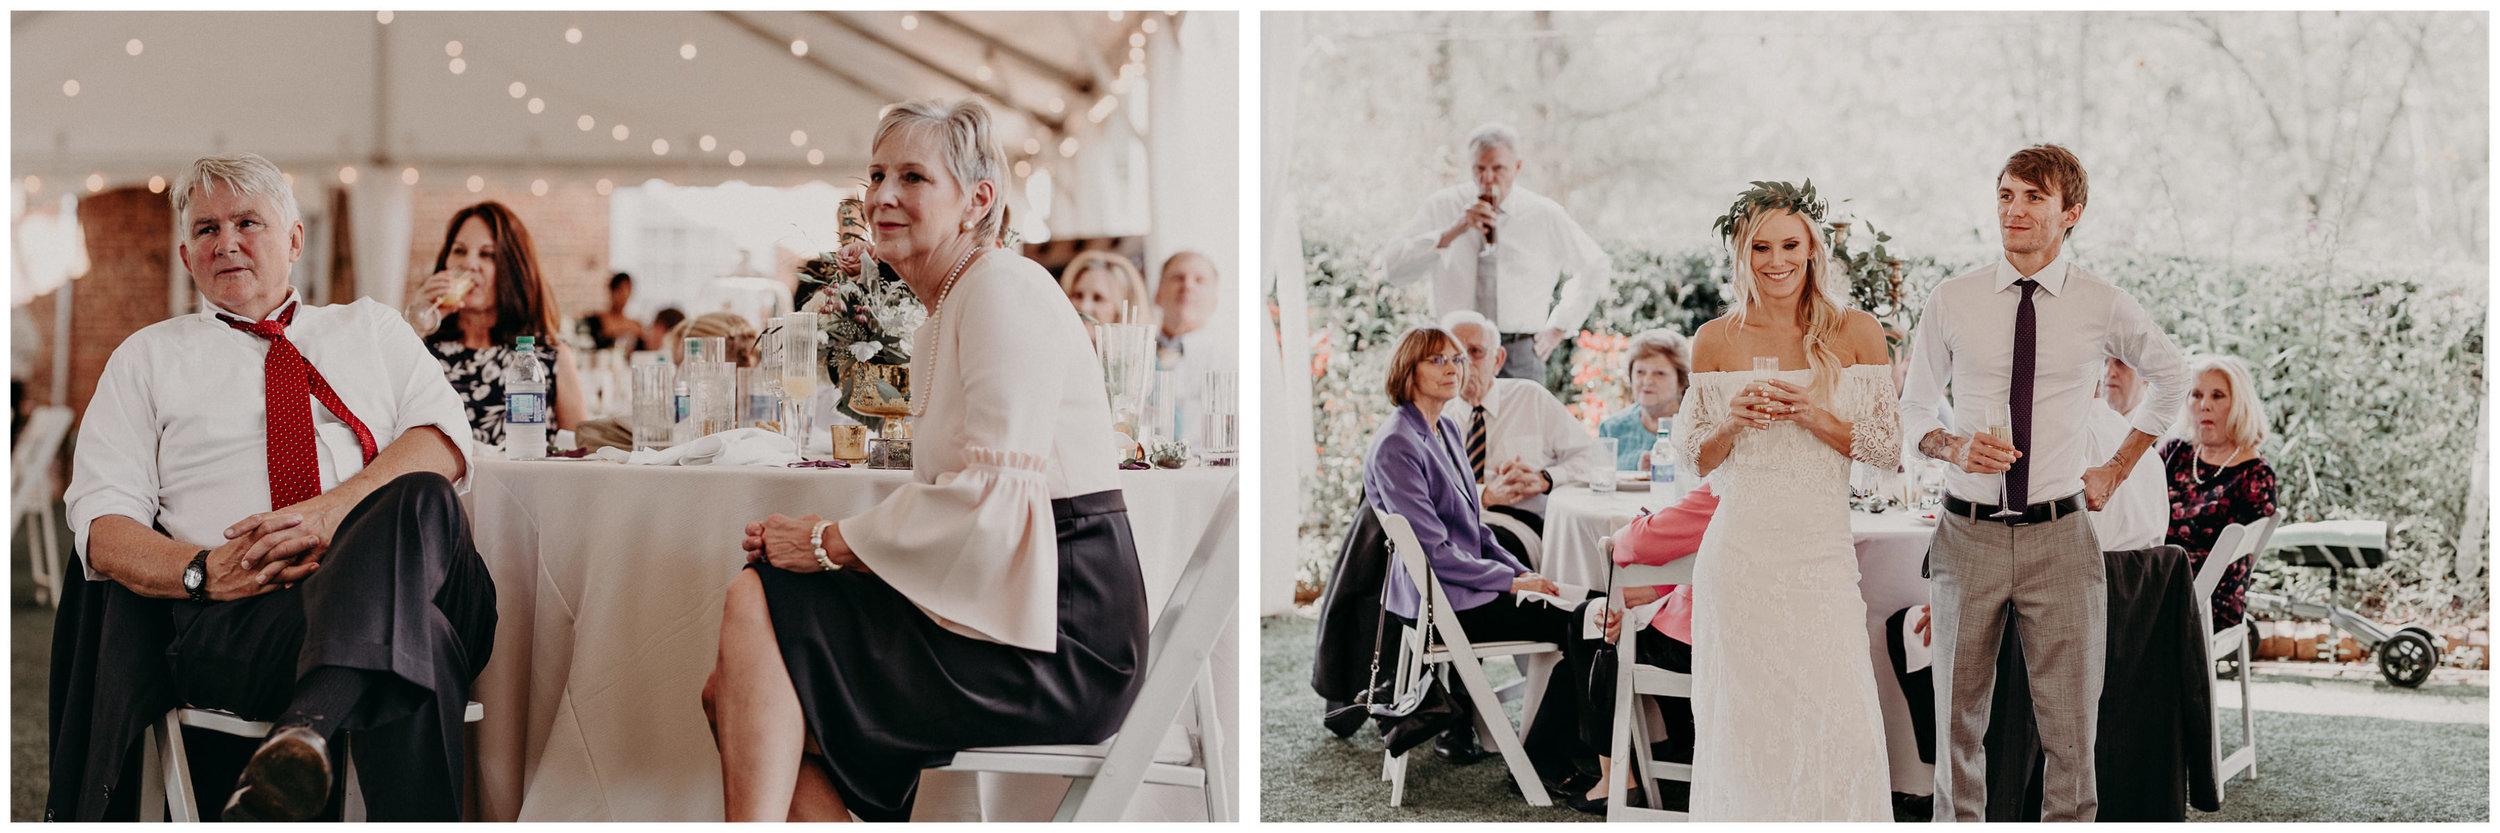 119 - Barnsley Gardens Wedding -Bride and groom portraits - Atlanta wedding photographer .jpg